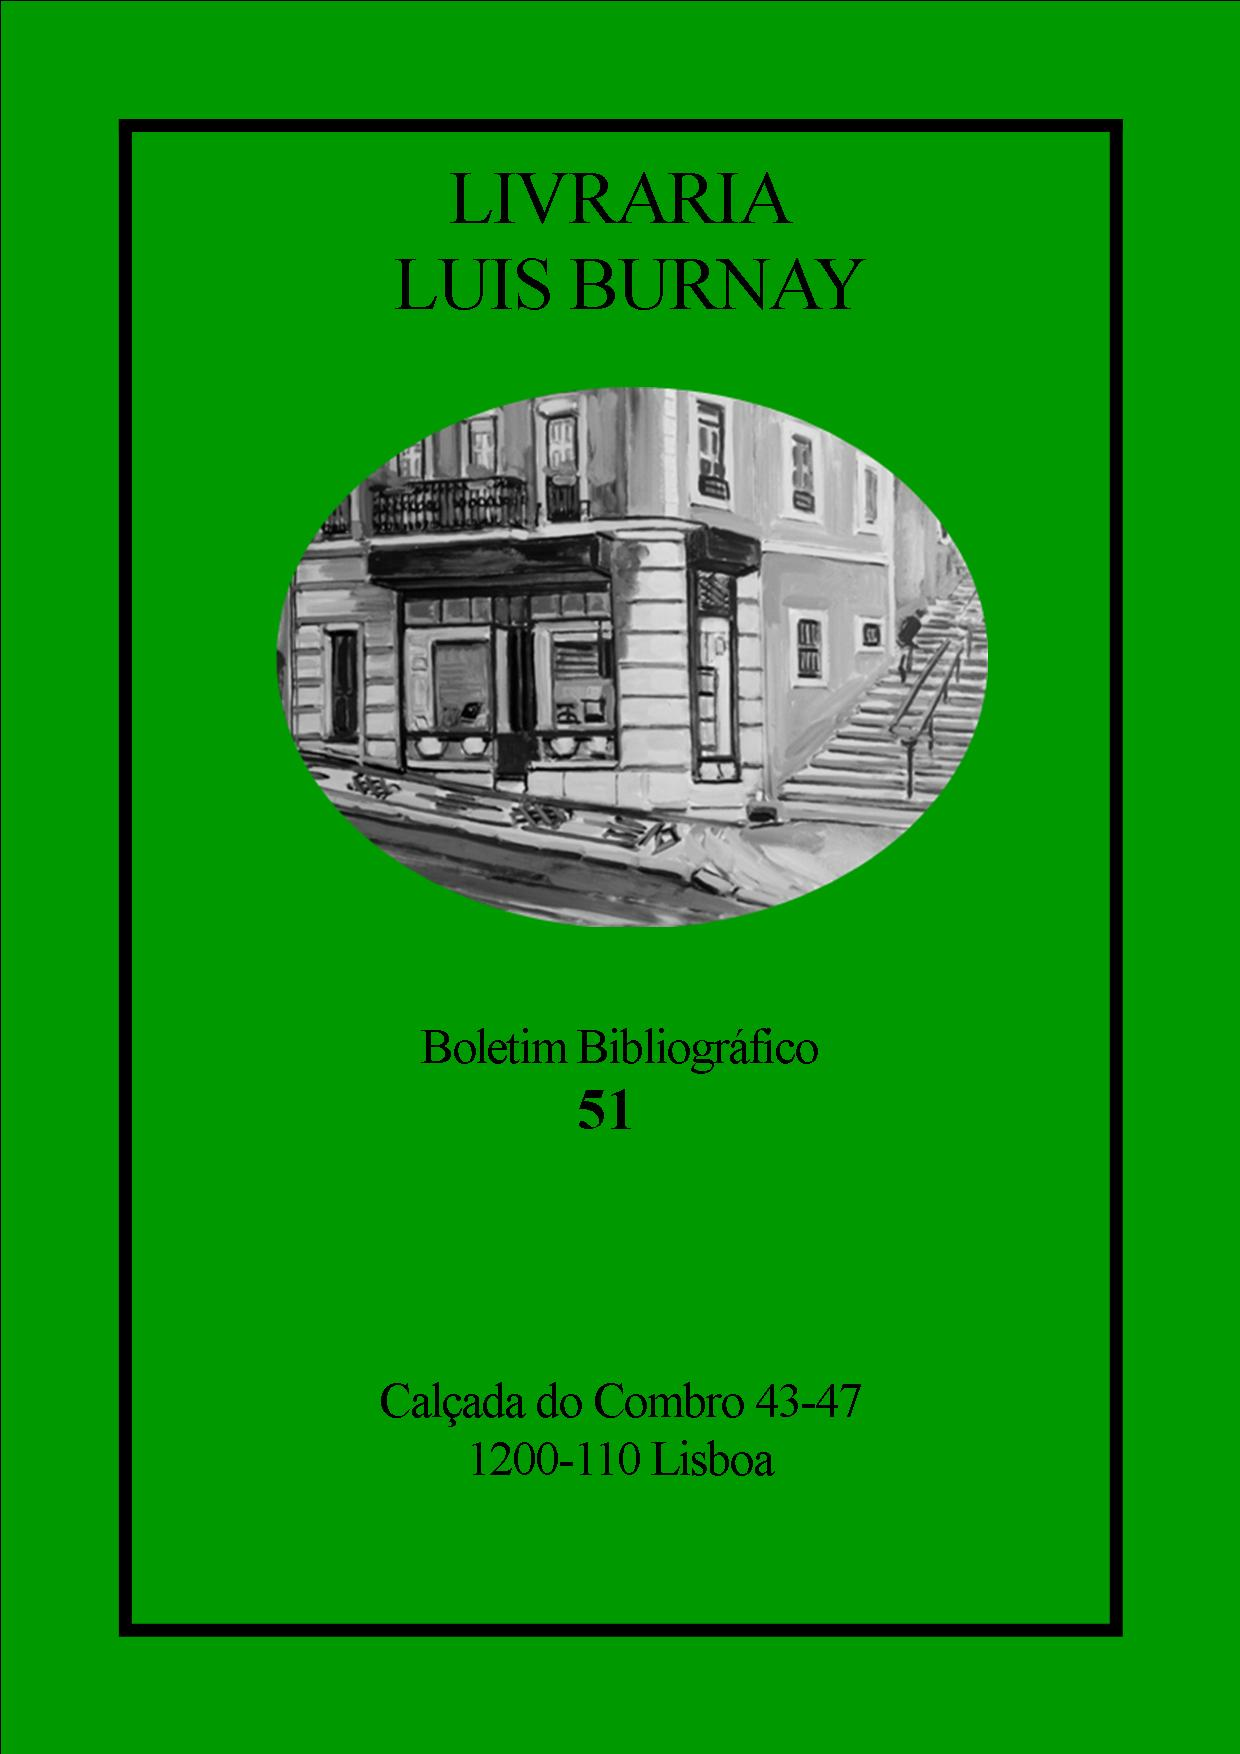 Boletim Bibliográfico nº 51